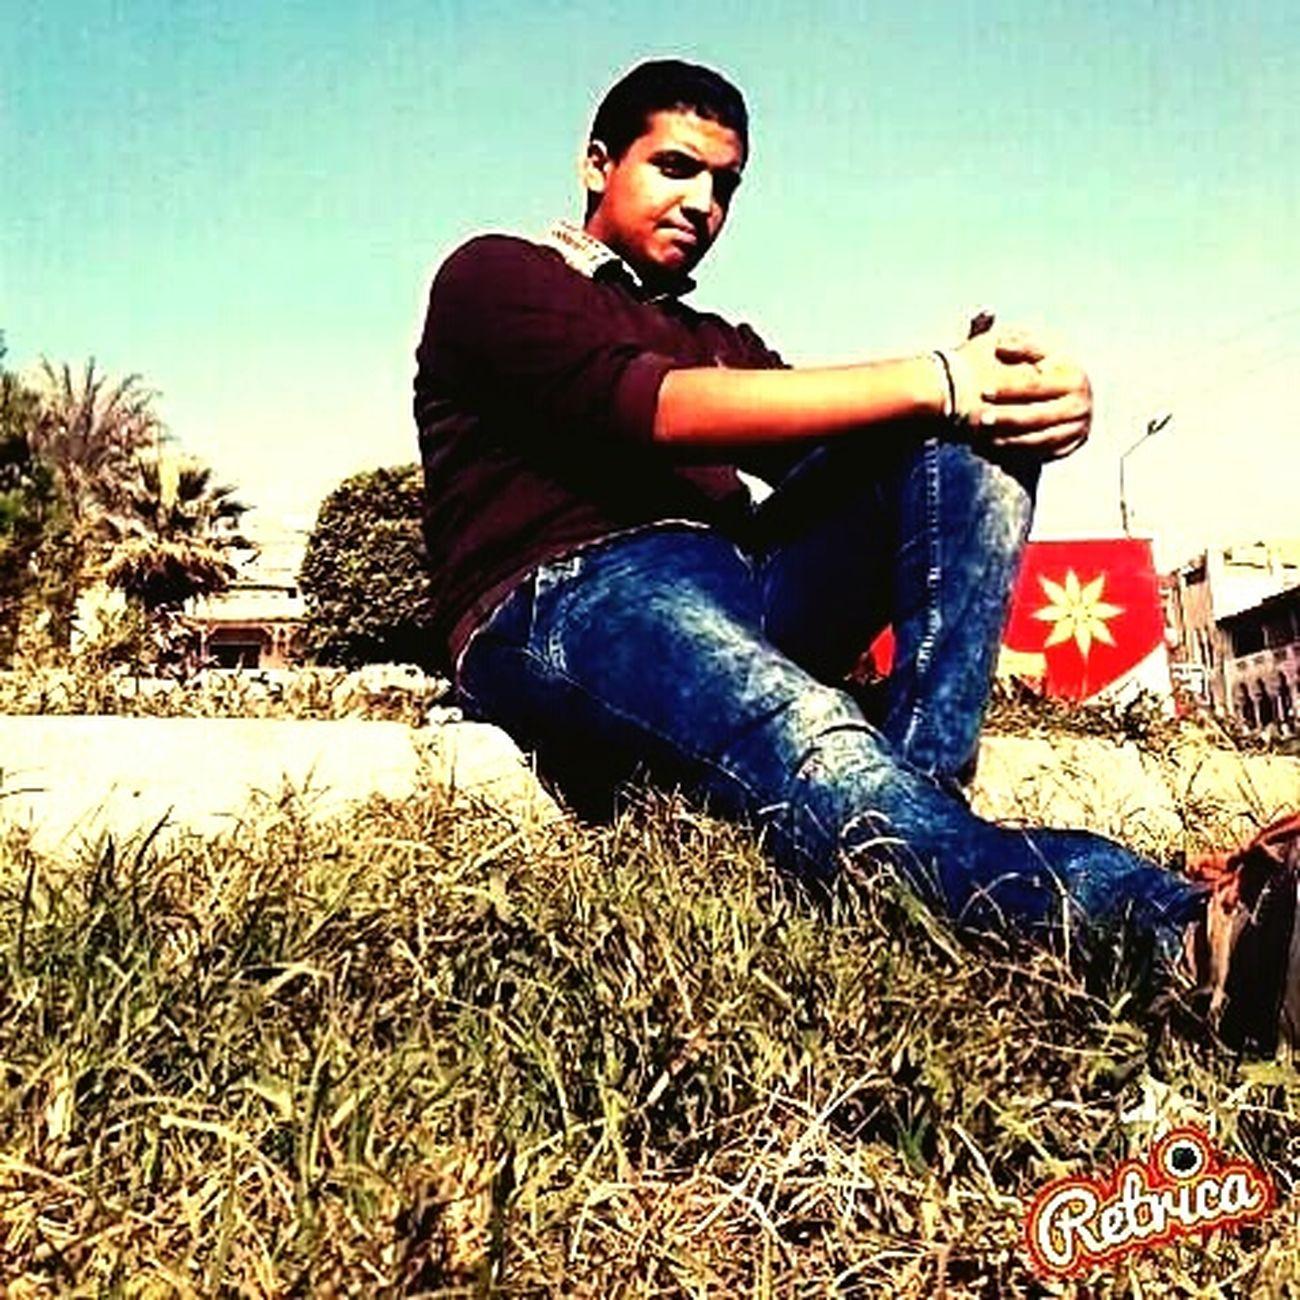 Yom 3ed melade Taking Photos mostafa